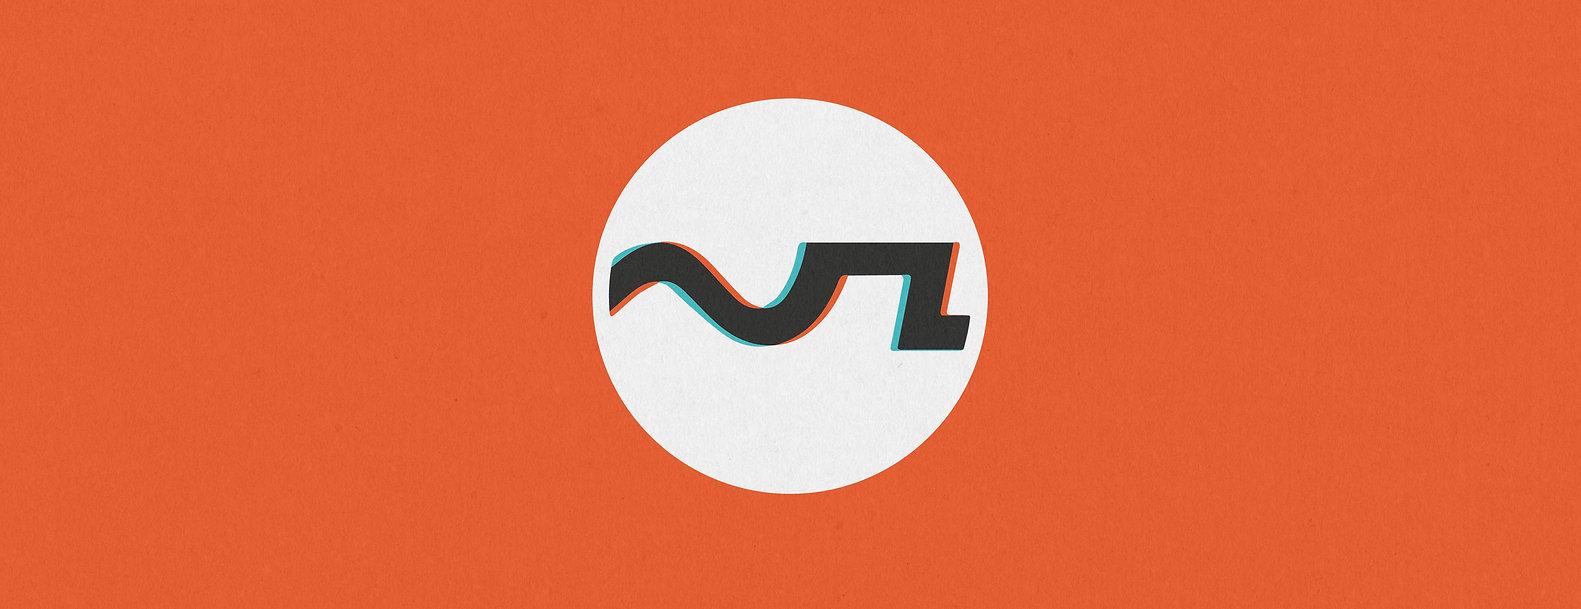 logo mockup6.jpg